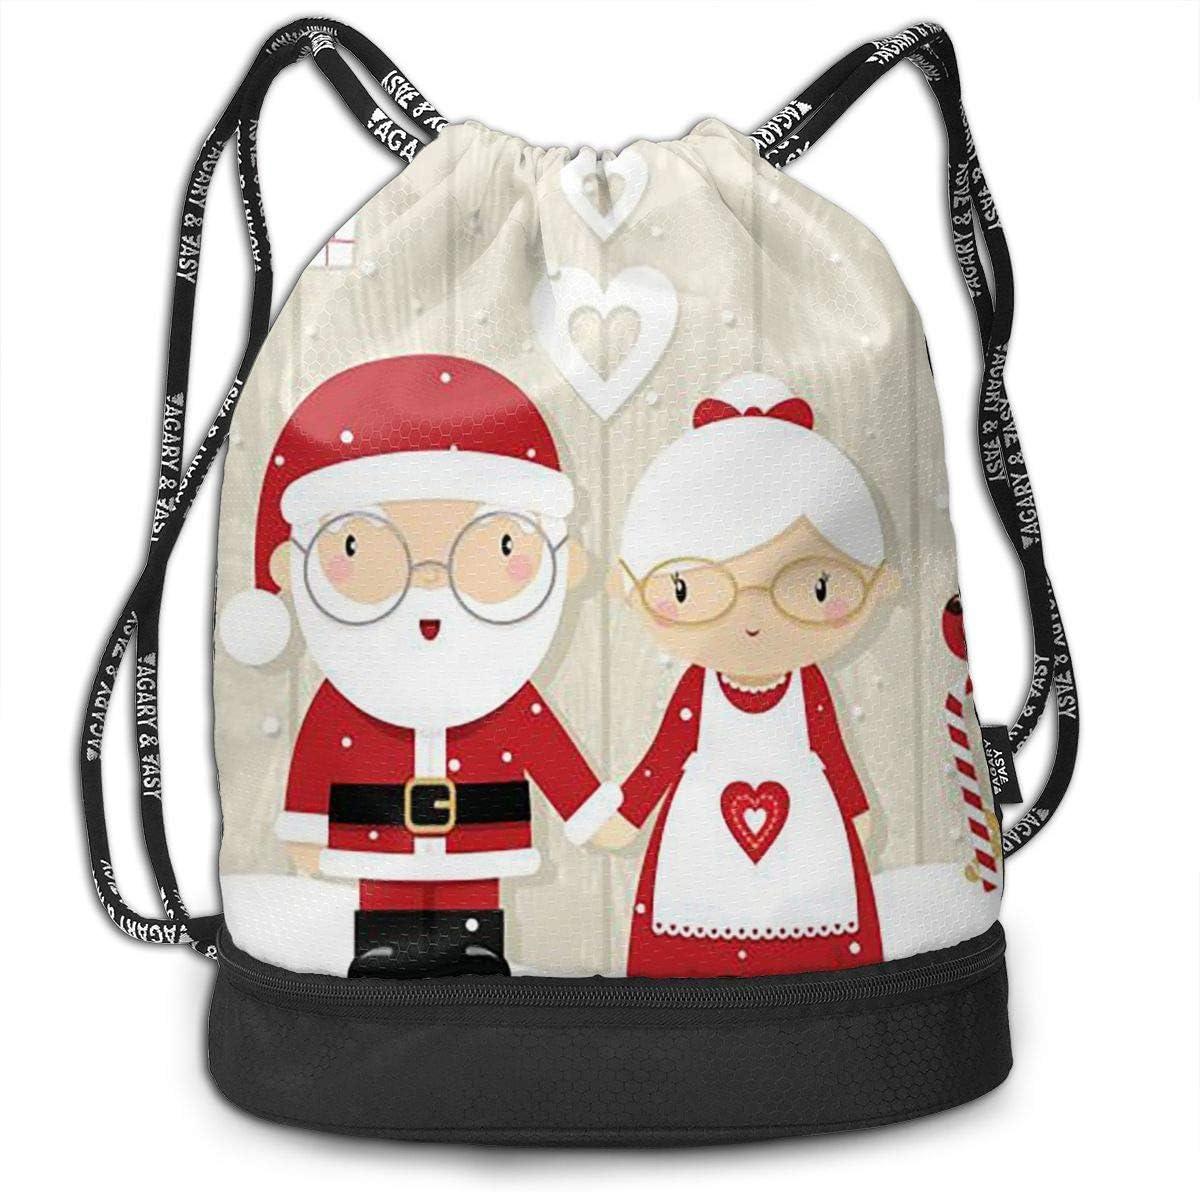 Drawstring Backpack Santa Claus Bags Knapsack For Hiking